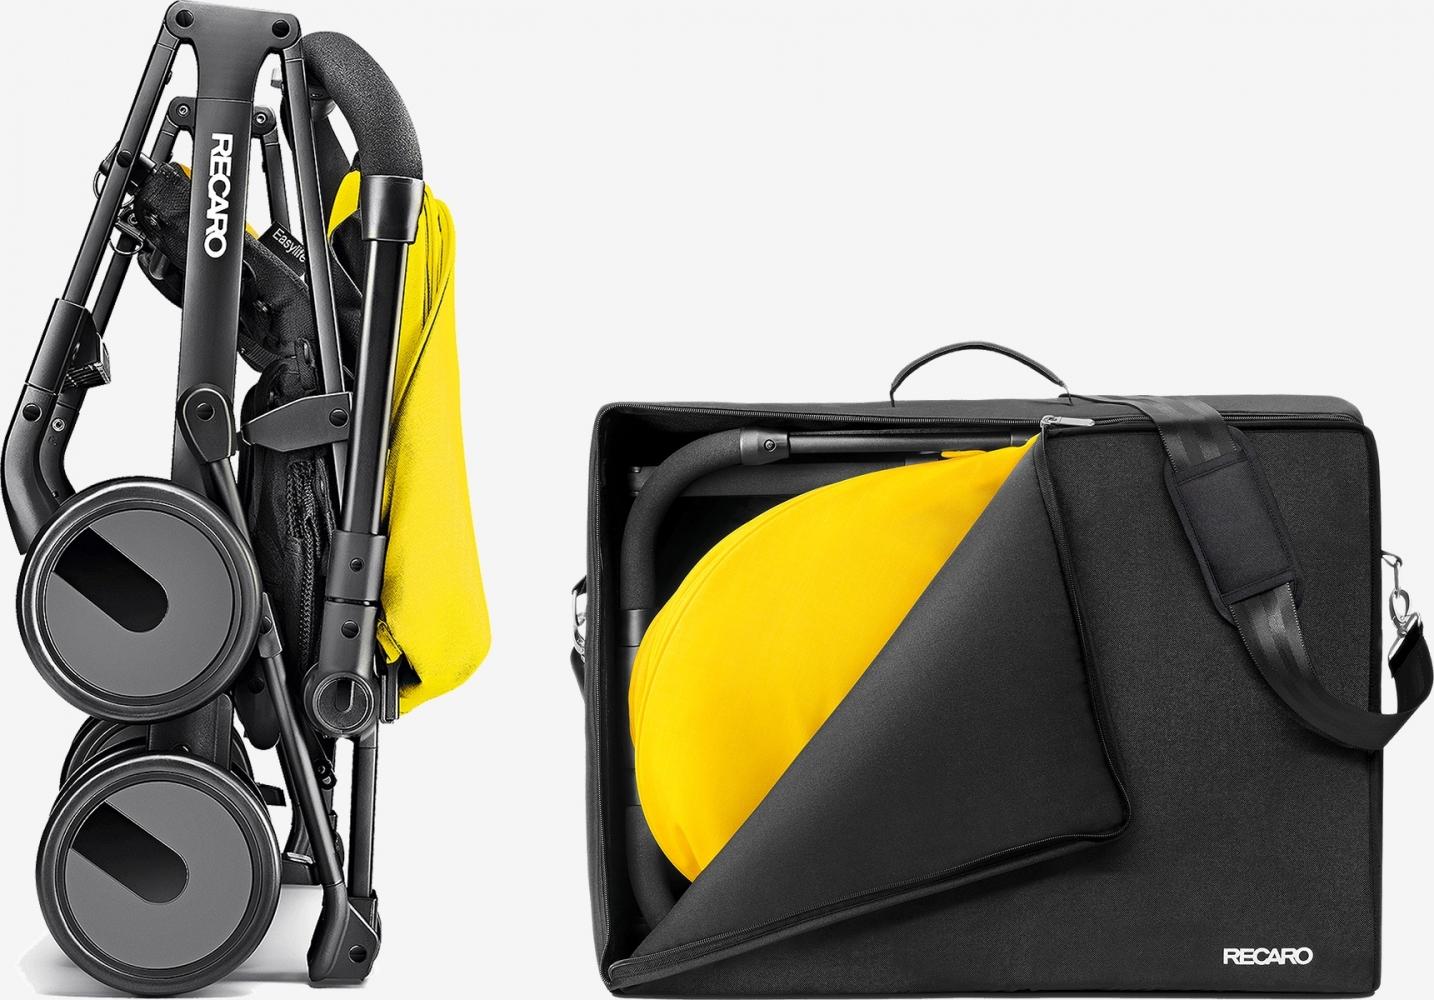 Recaro Easylife Travel Bag * Black Color *